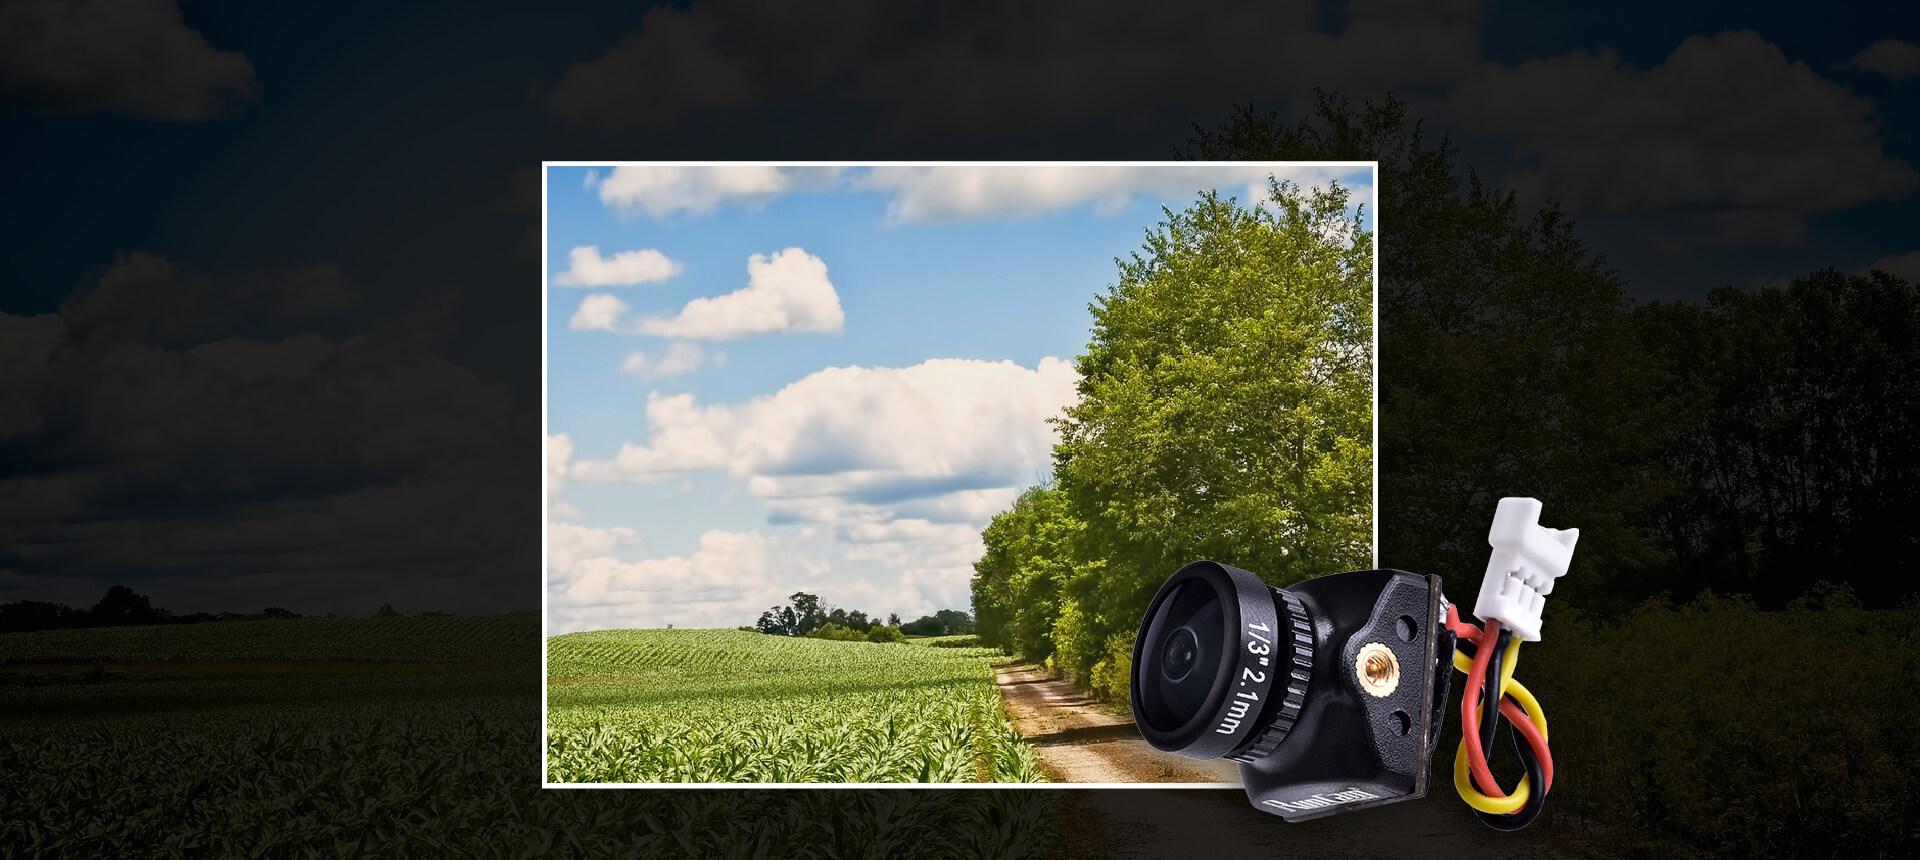 FPV камера RunCam Nano 2 FPV - 2,1 мм